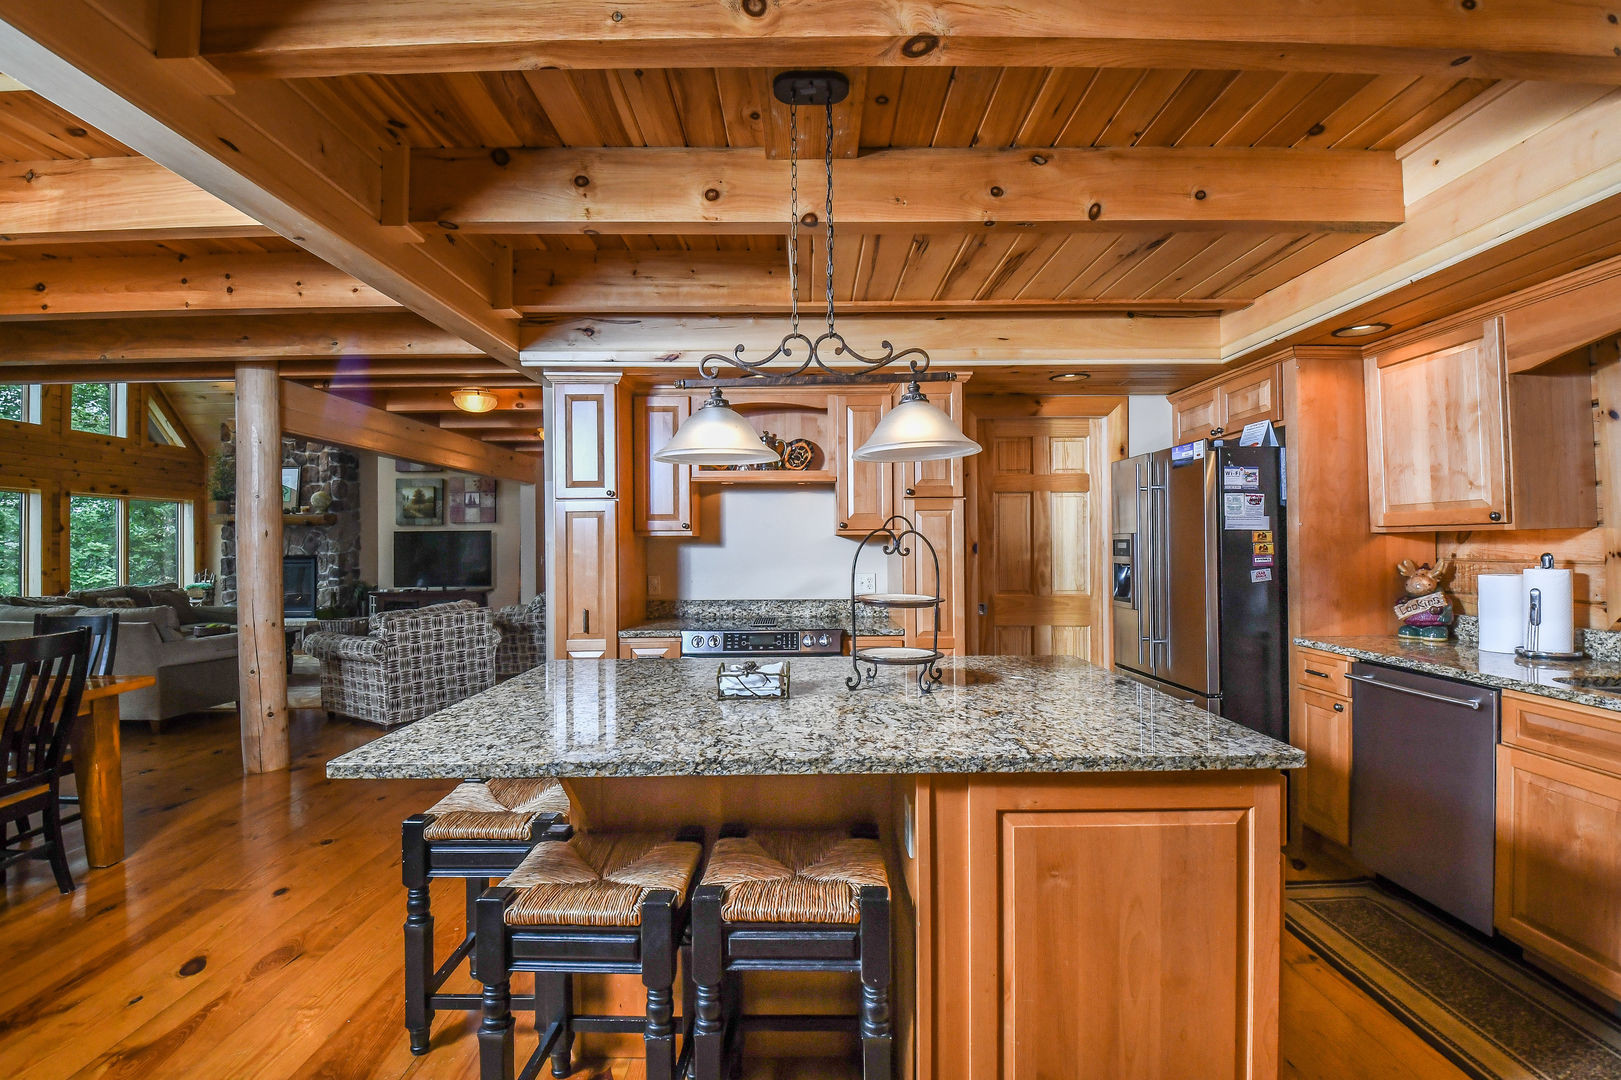 hardwood flooring black friday sale of highlands heaven taylor made deep creek vacations sales throughout image 152862584